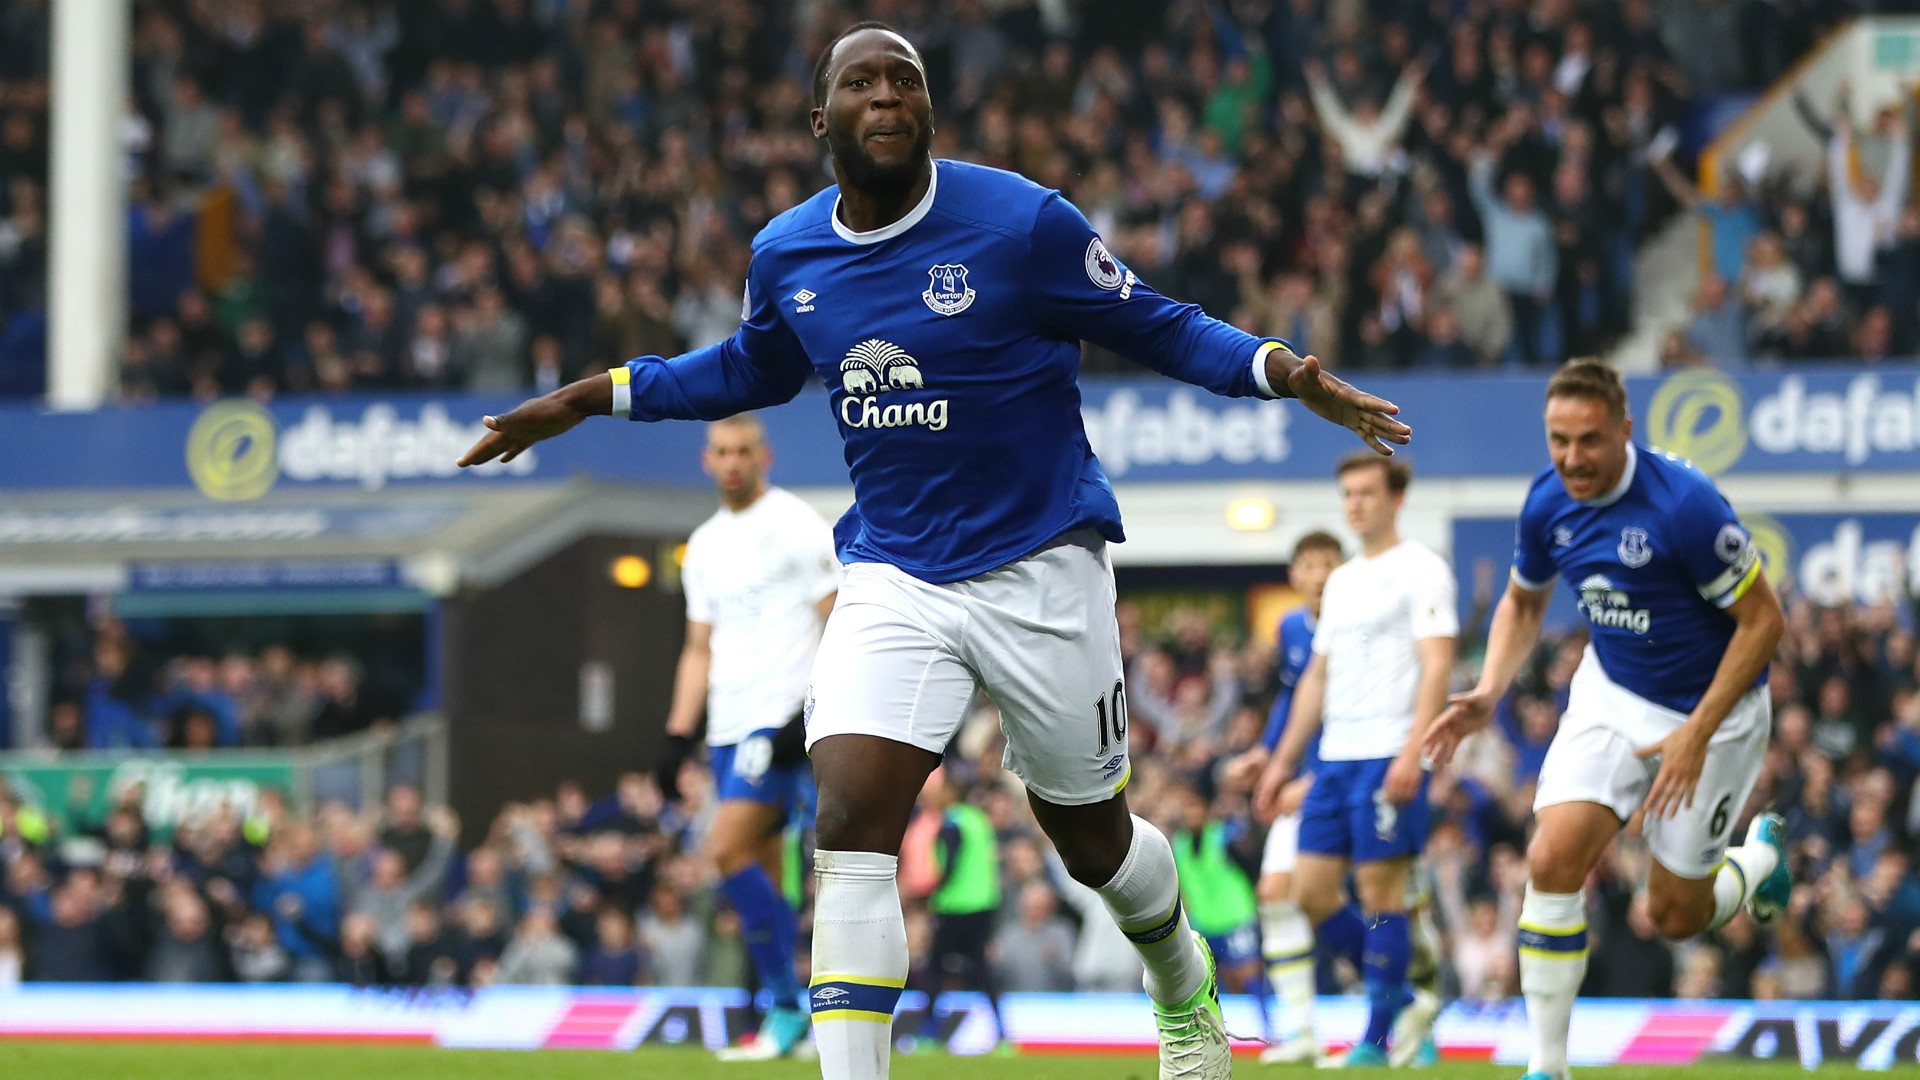 Koeman ready to fight to keep Chelsea and Man Utd target Lukaku at Everton